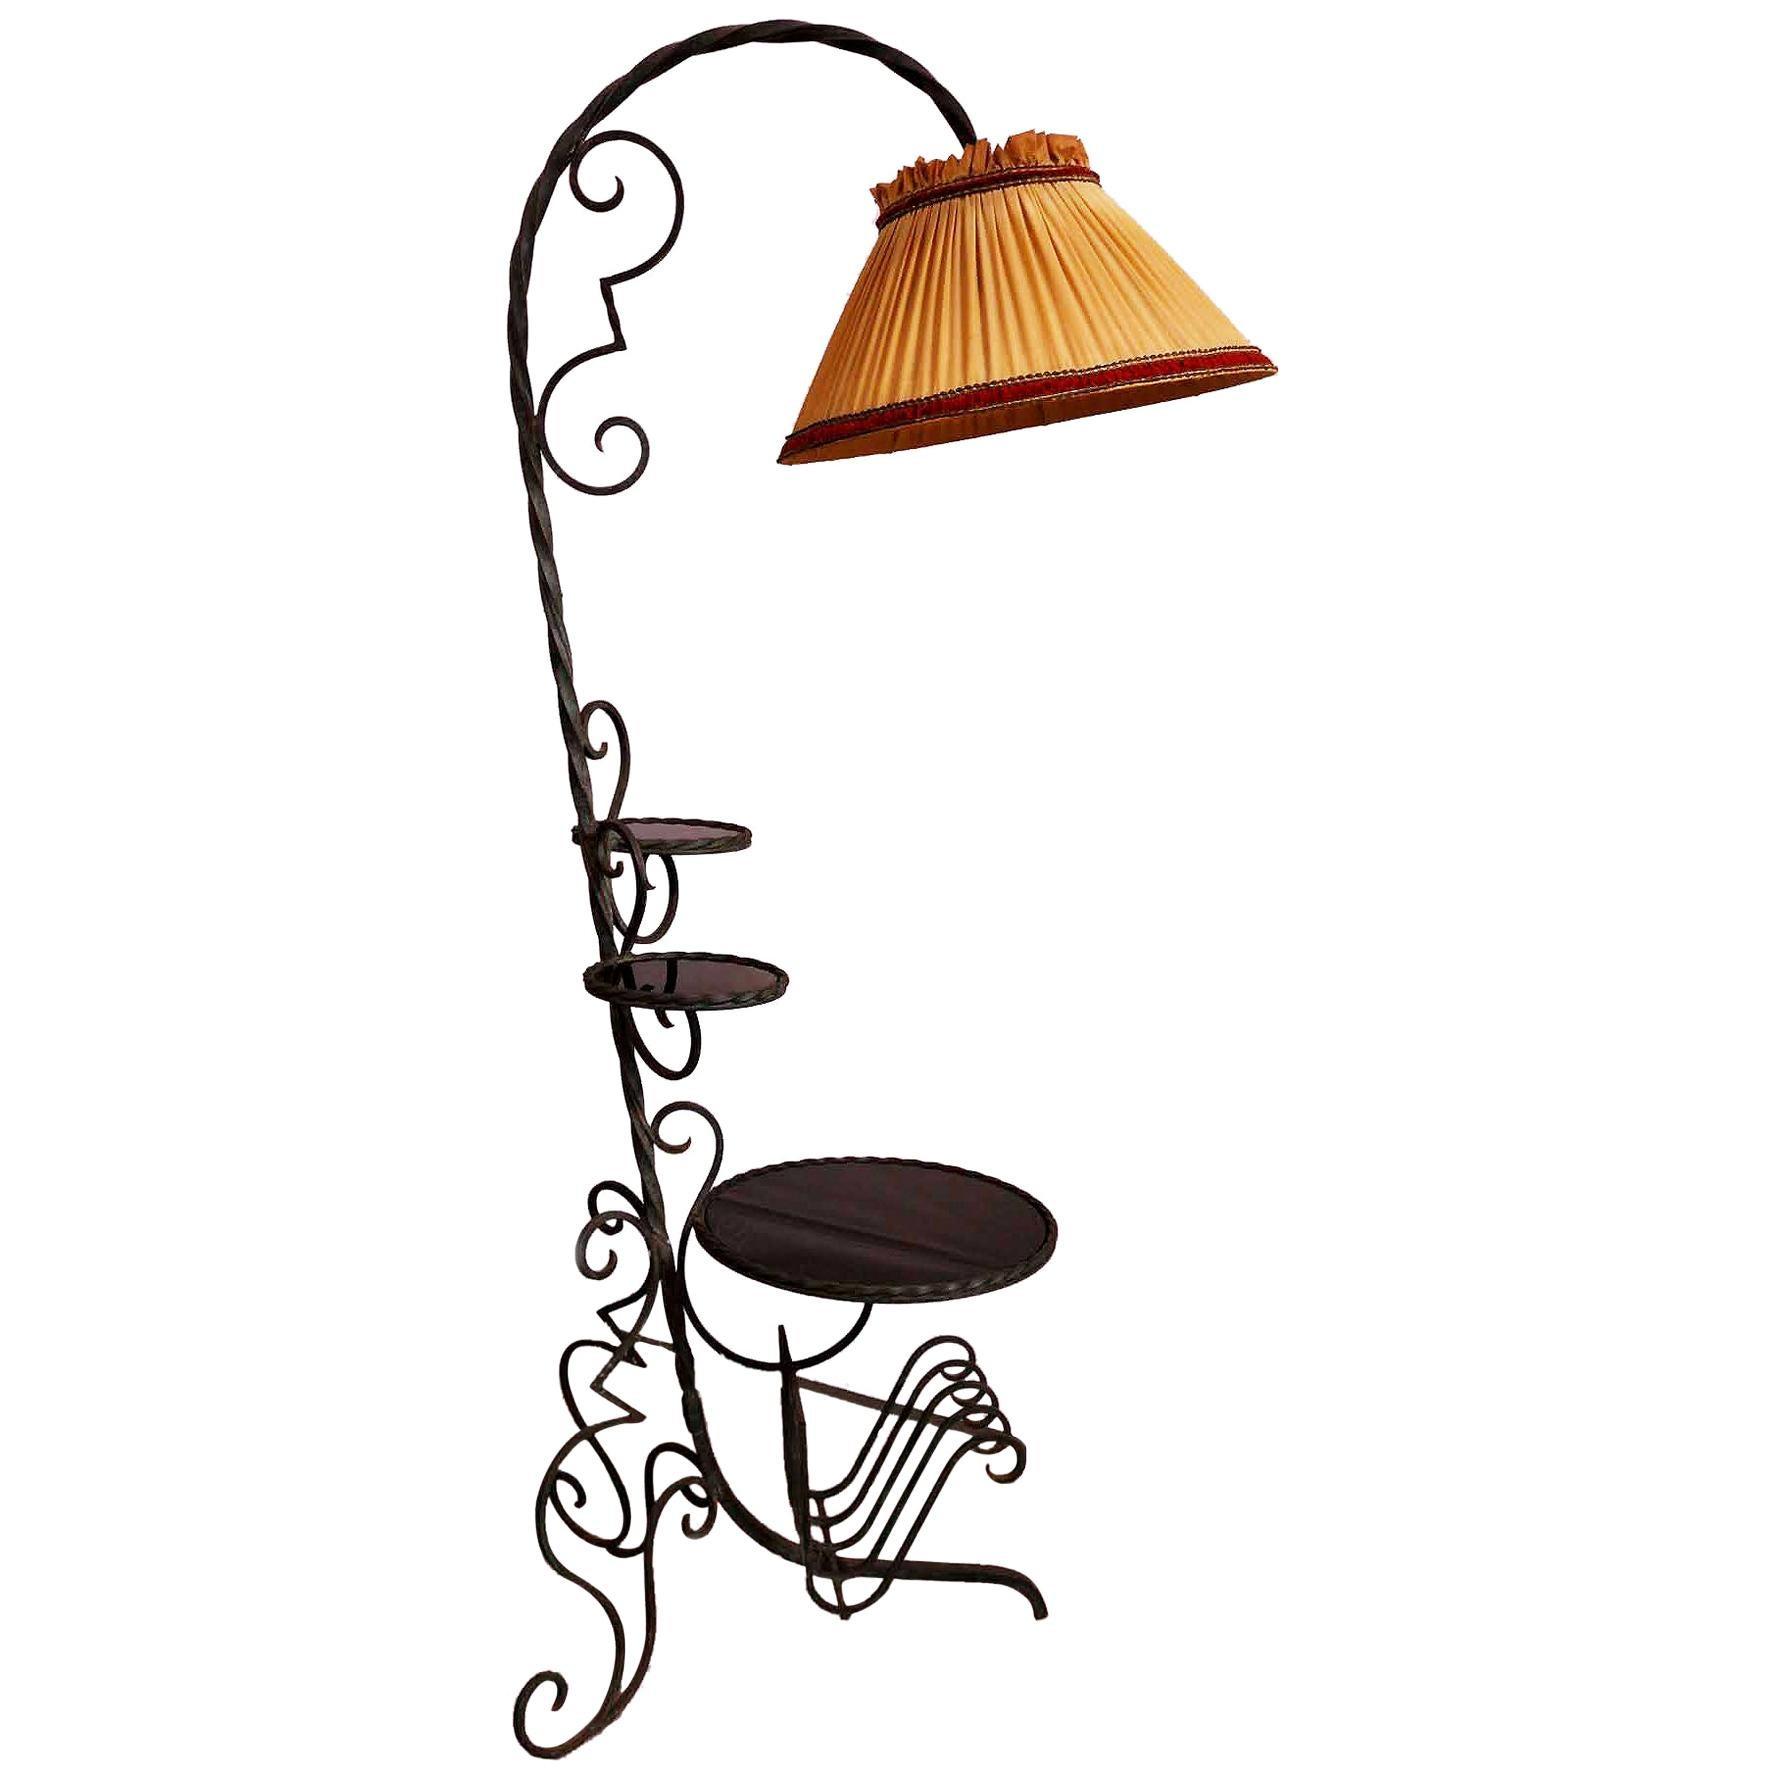 Midcentury Floor Lamp French Wrought Iron Black Glass Plant Stand Magazine Rack